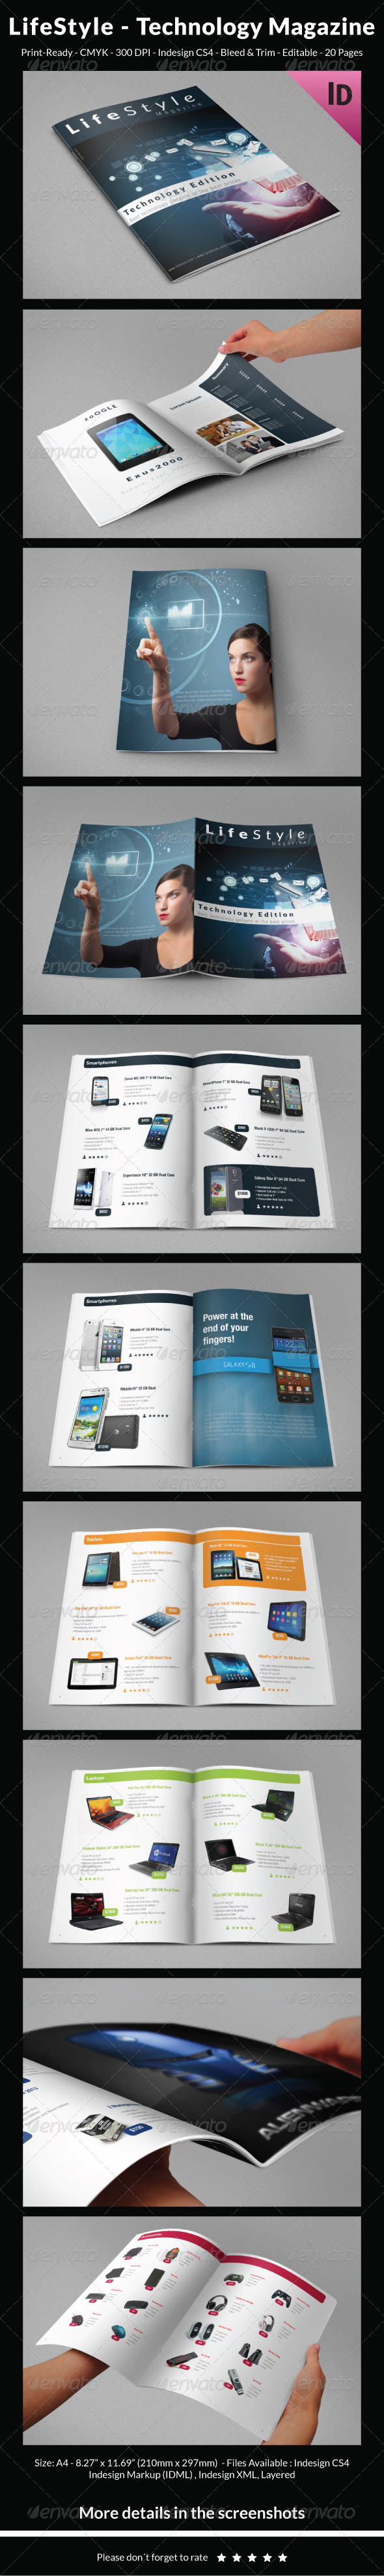 LifeStyle – Technology Magazine - Magazines Print Templates